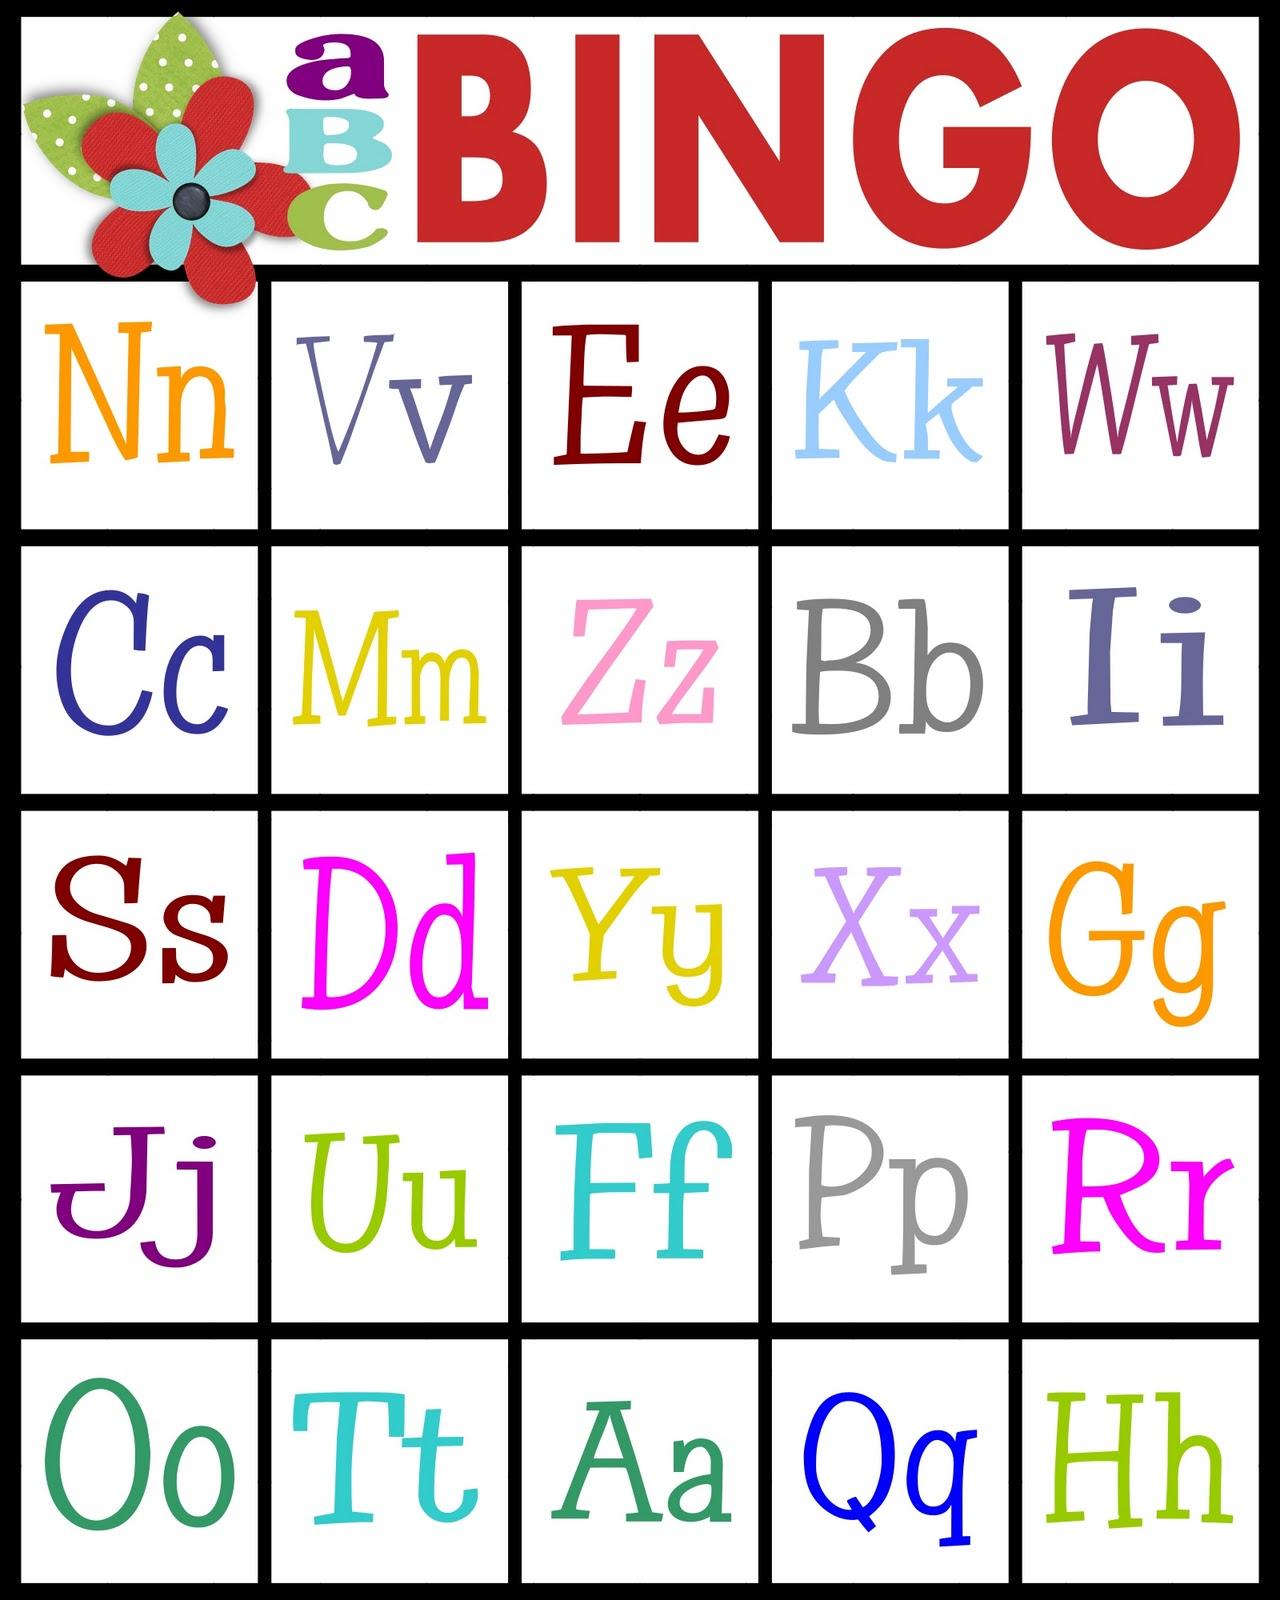 Abc S Bingo Free Printable